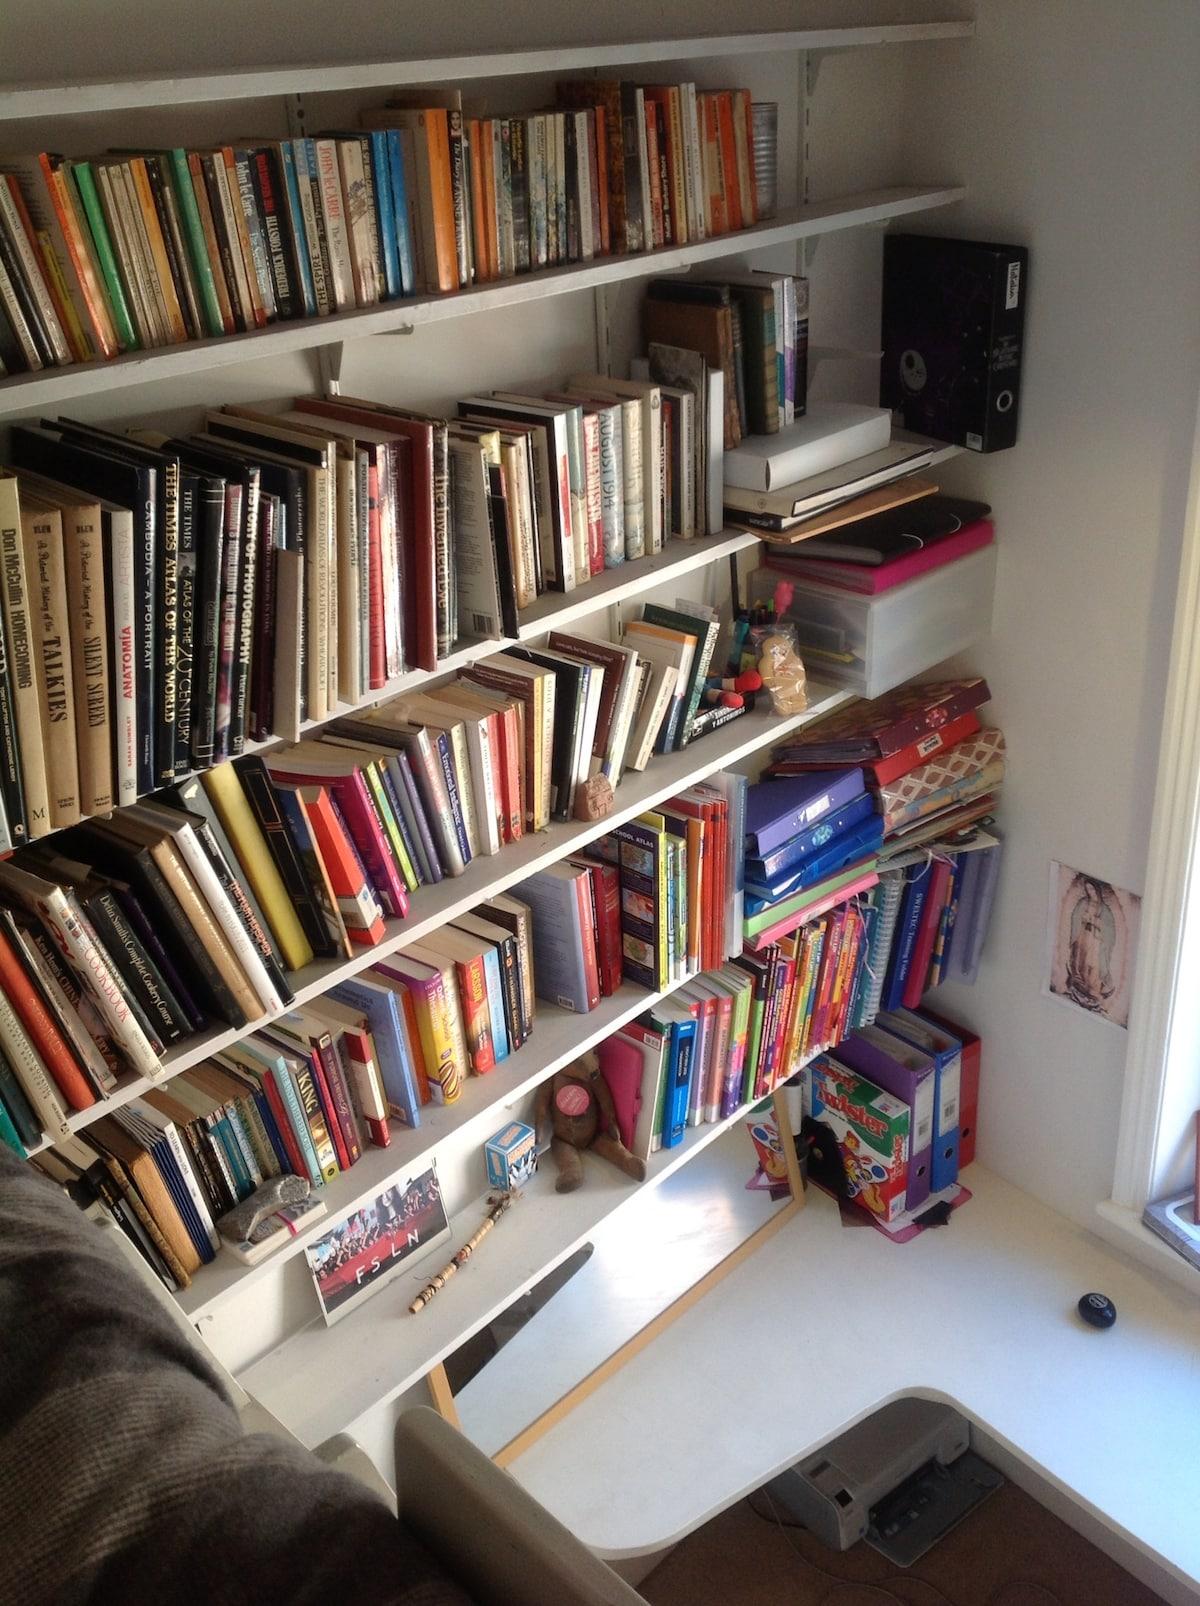 The sunny room in Kensington